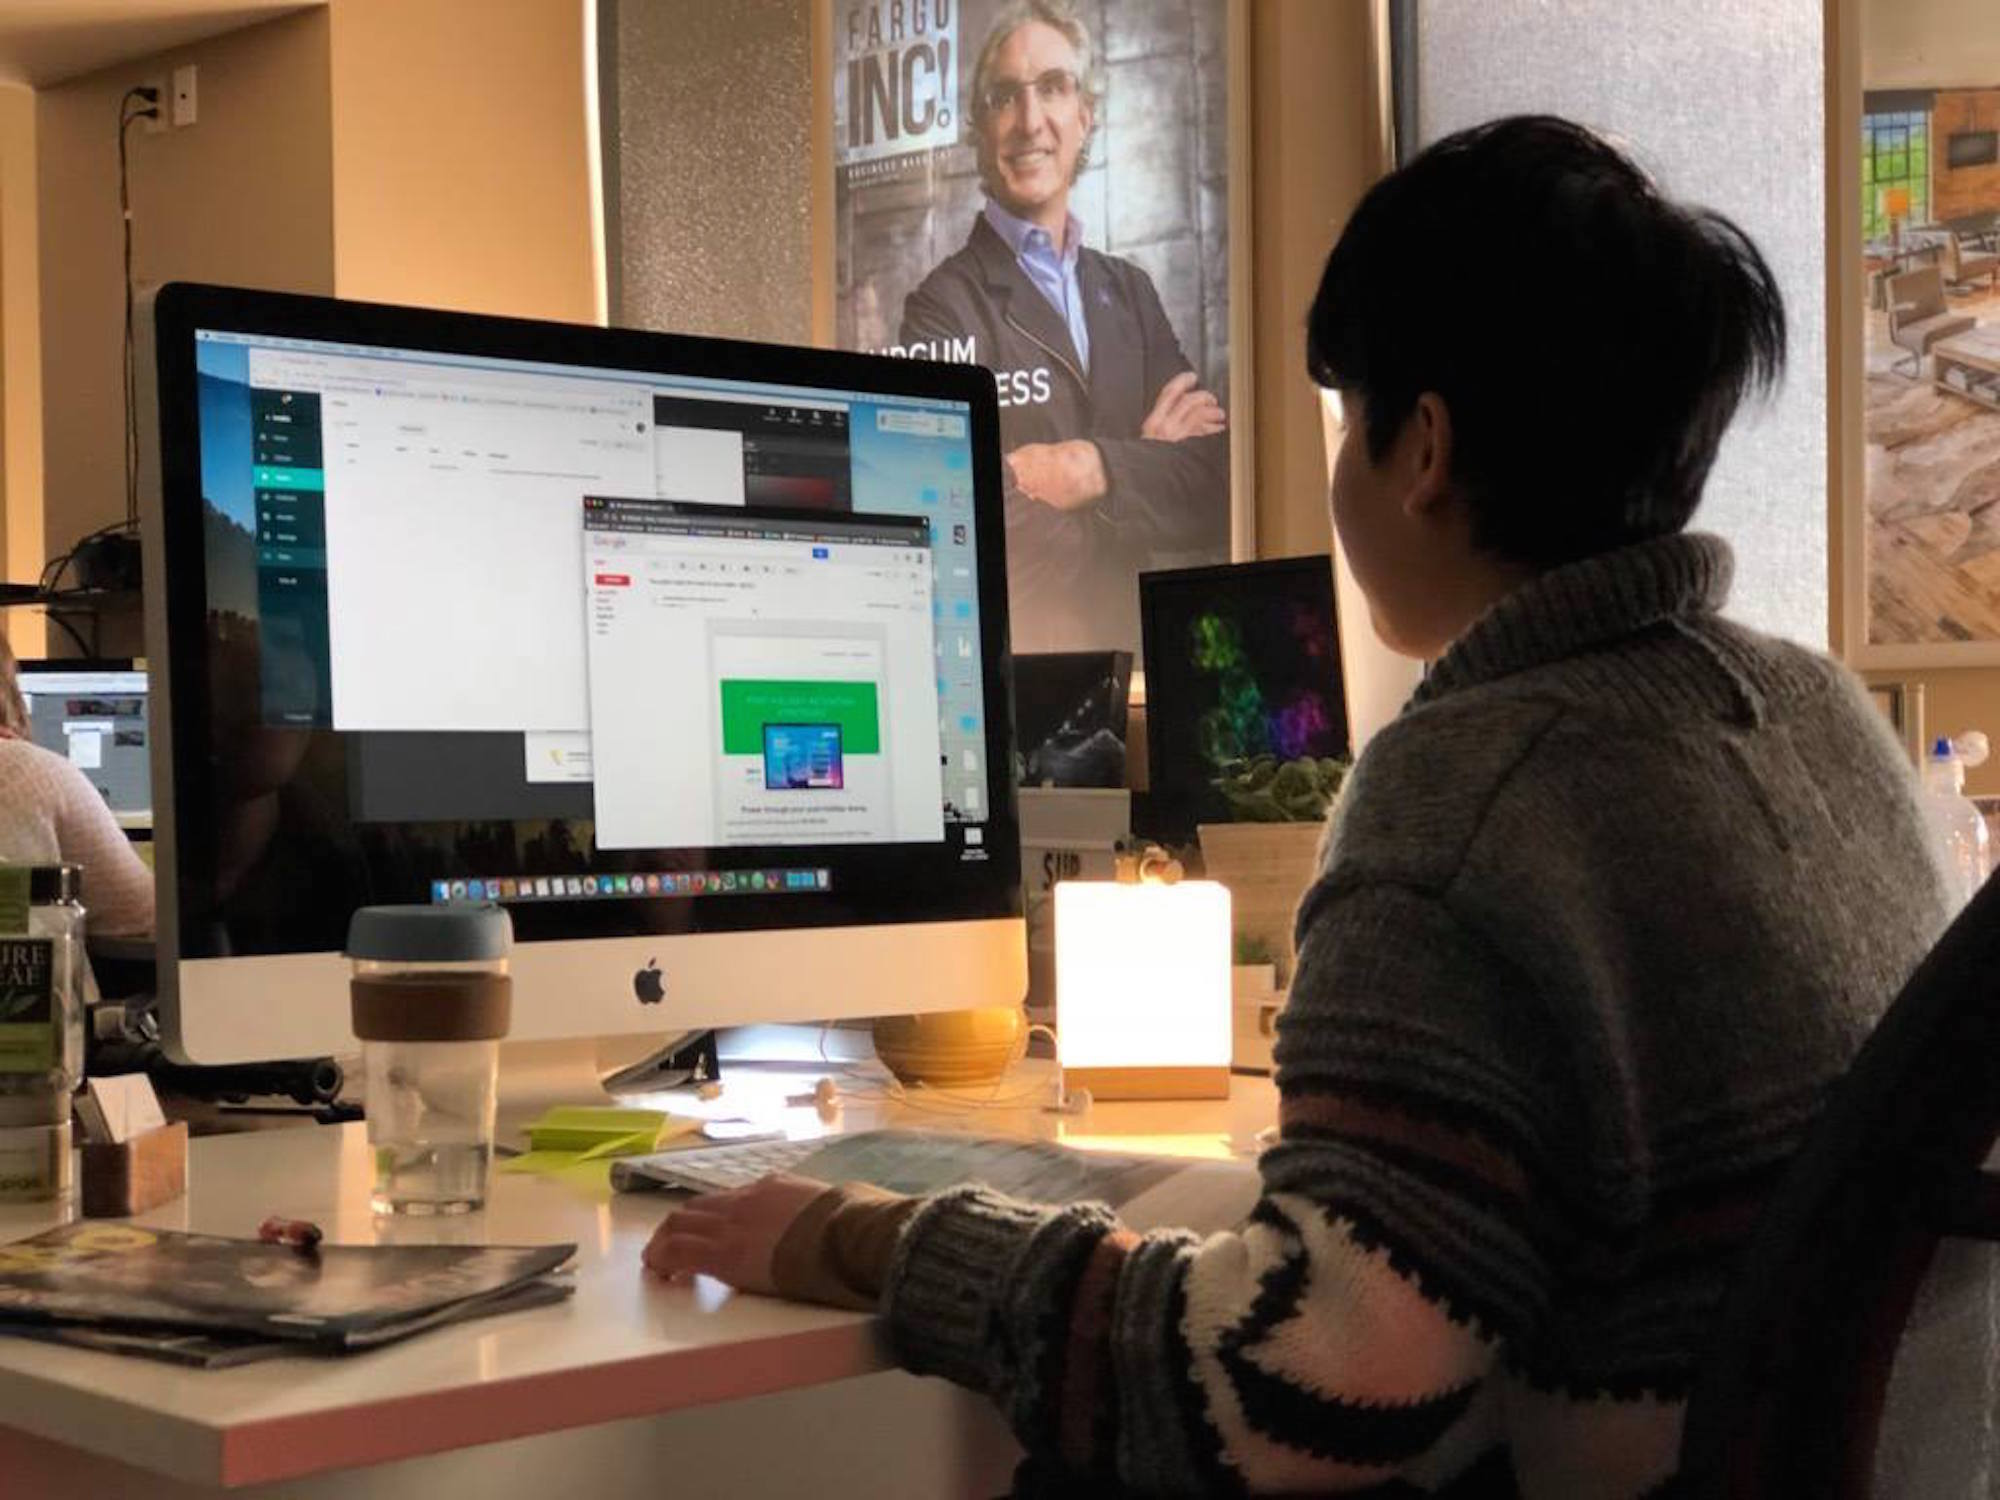 Huong Tran '17 works in the Spotlight Media digital suite.